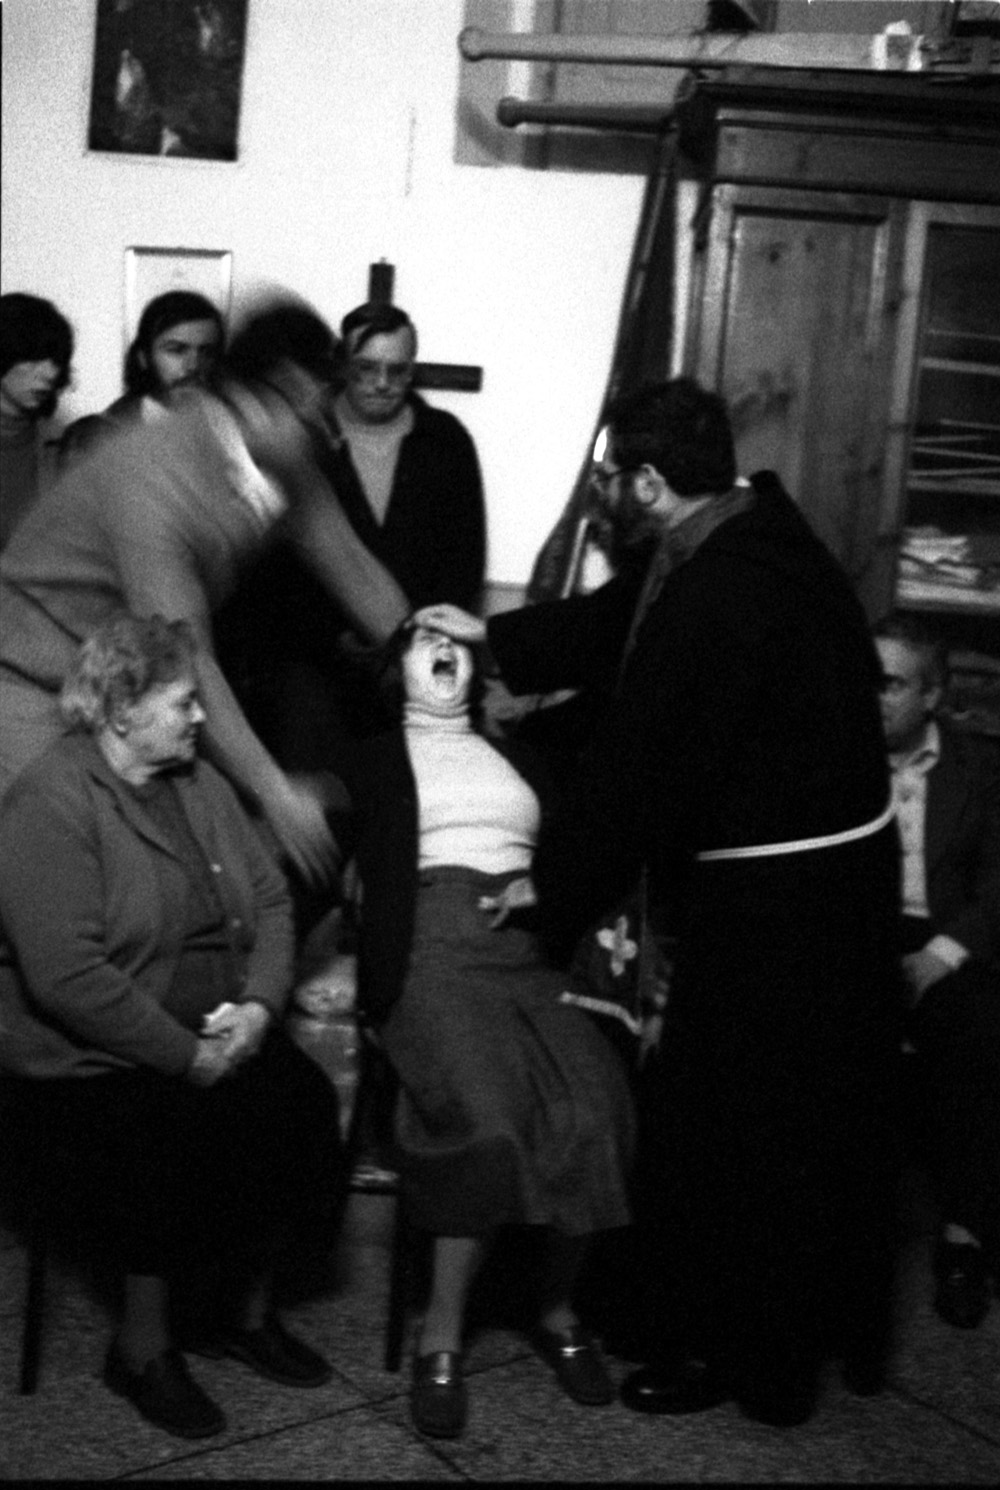 Esorcismo - 1980